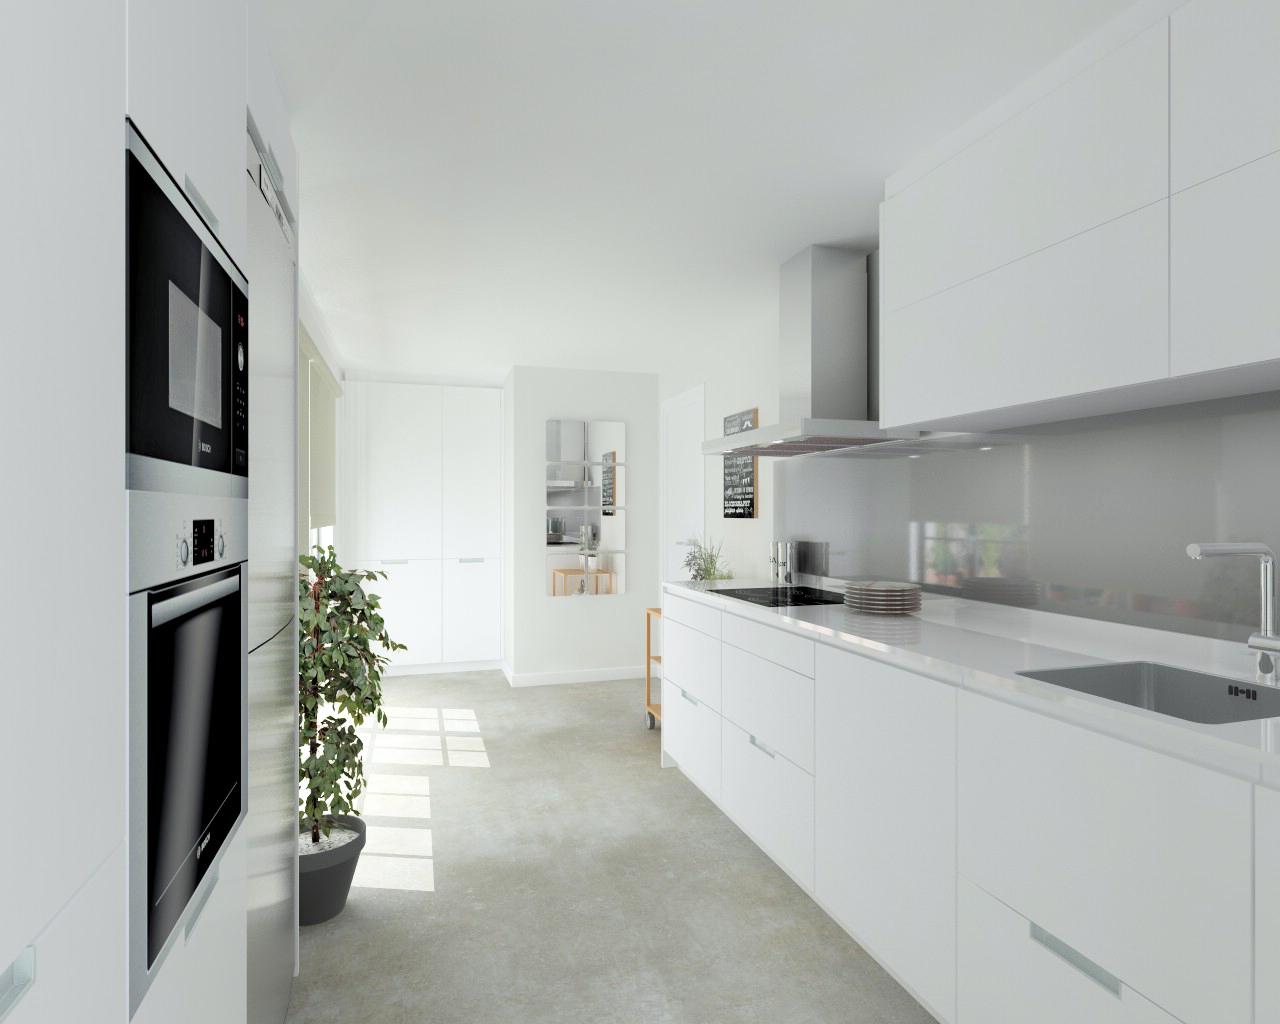 Imagen1 estudio cocinas dc for Cocinas angostas